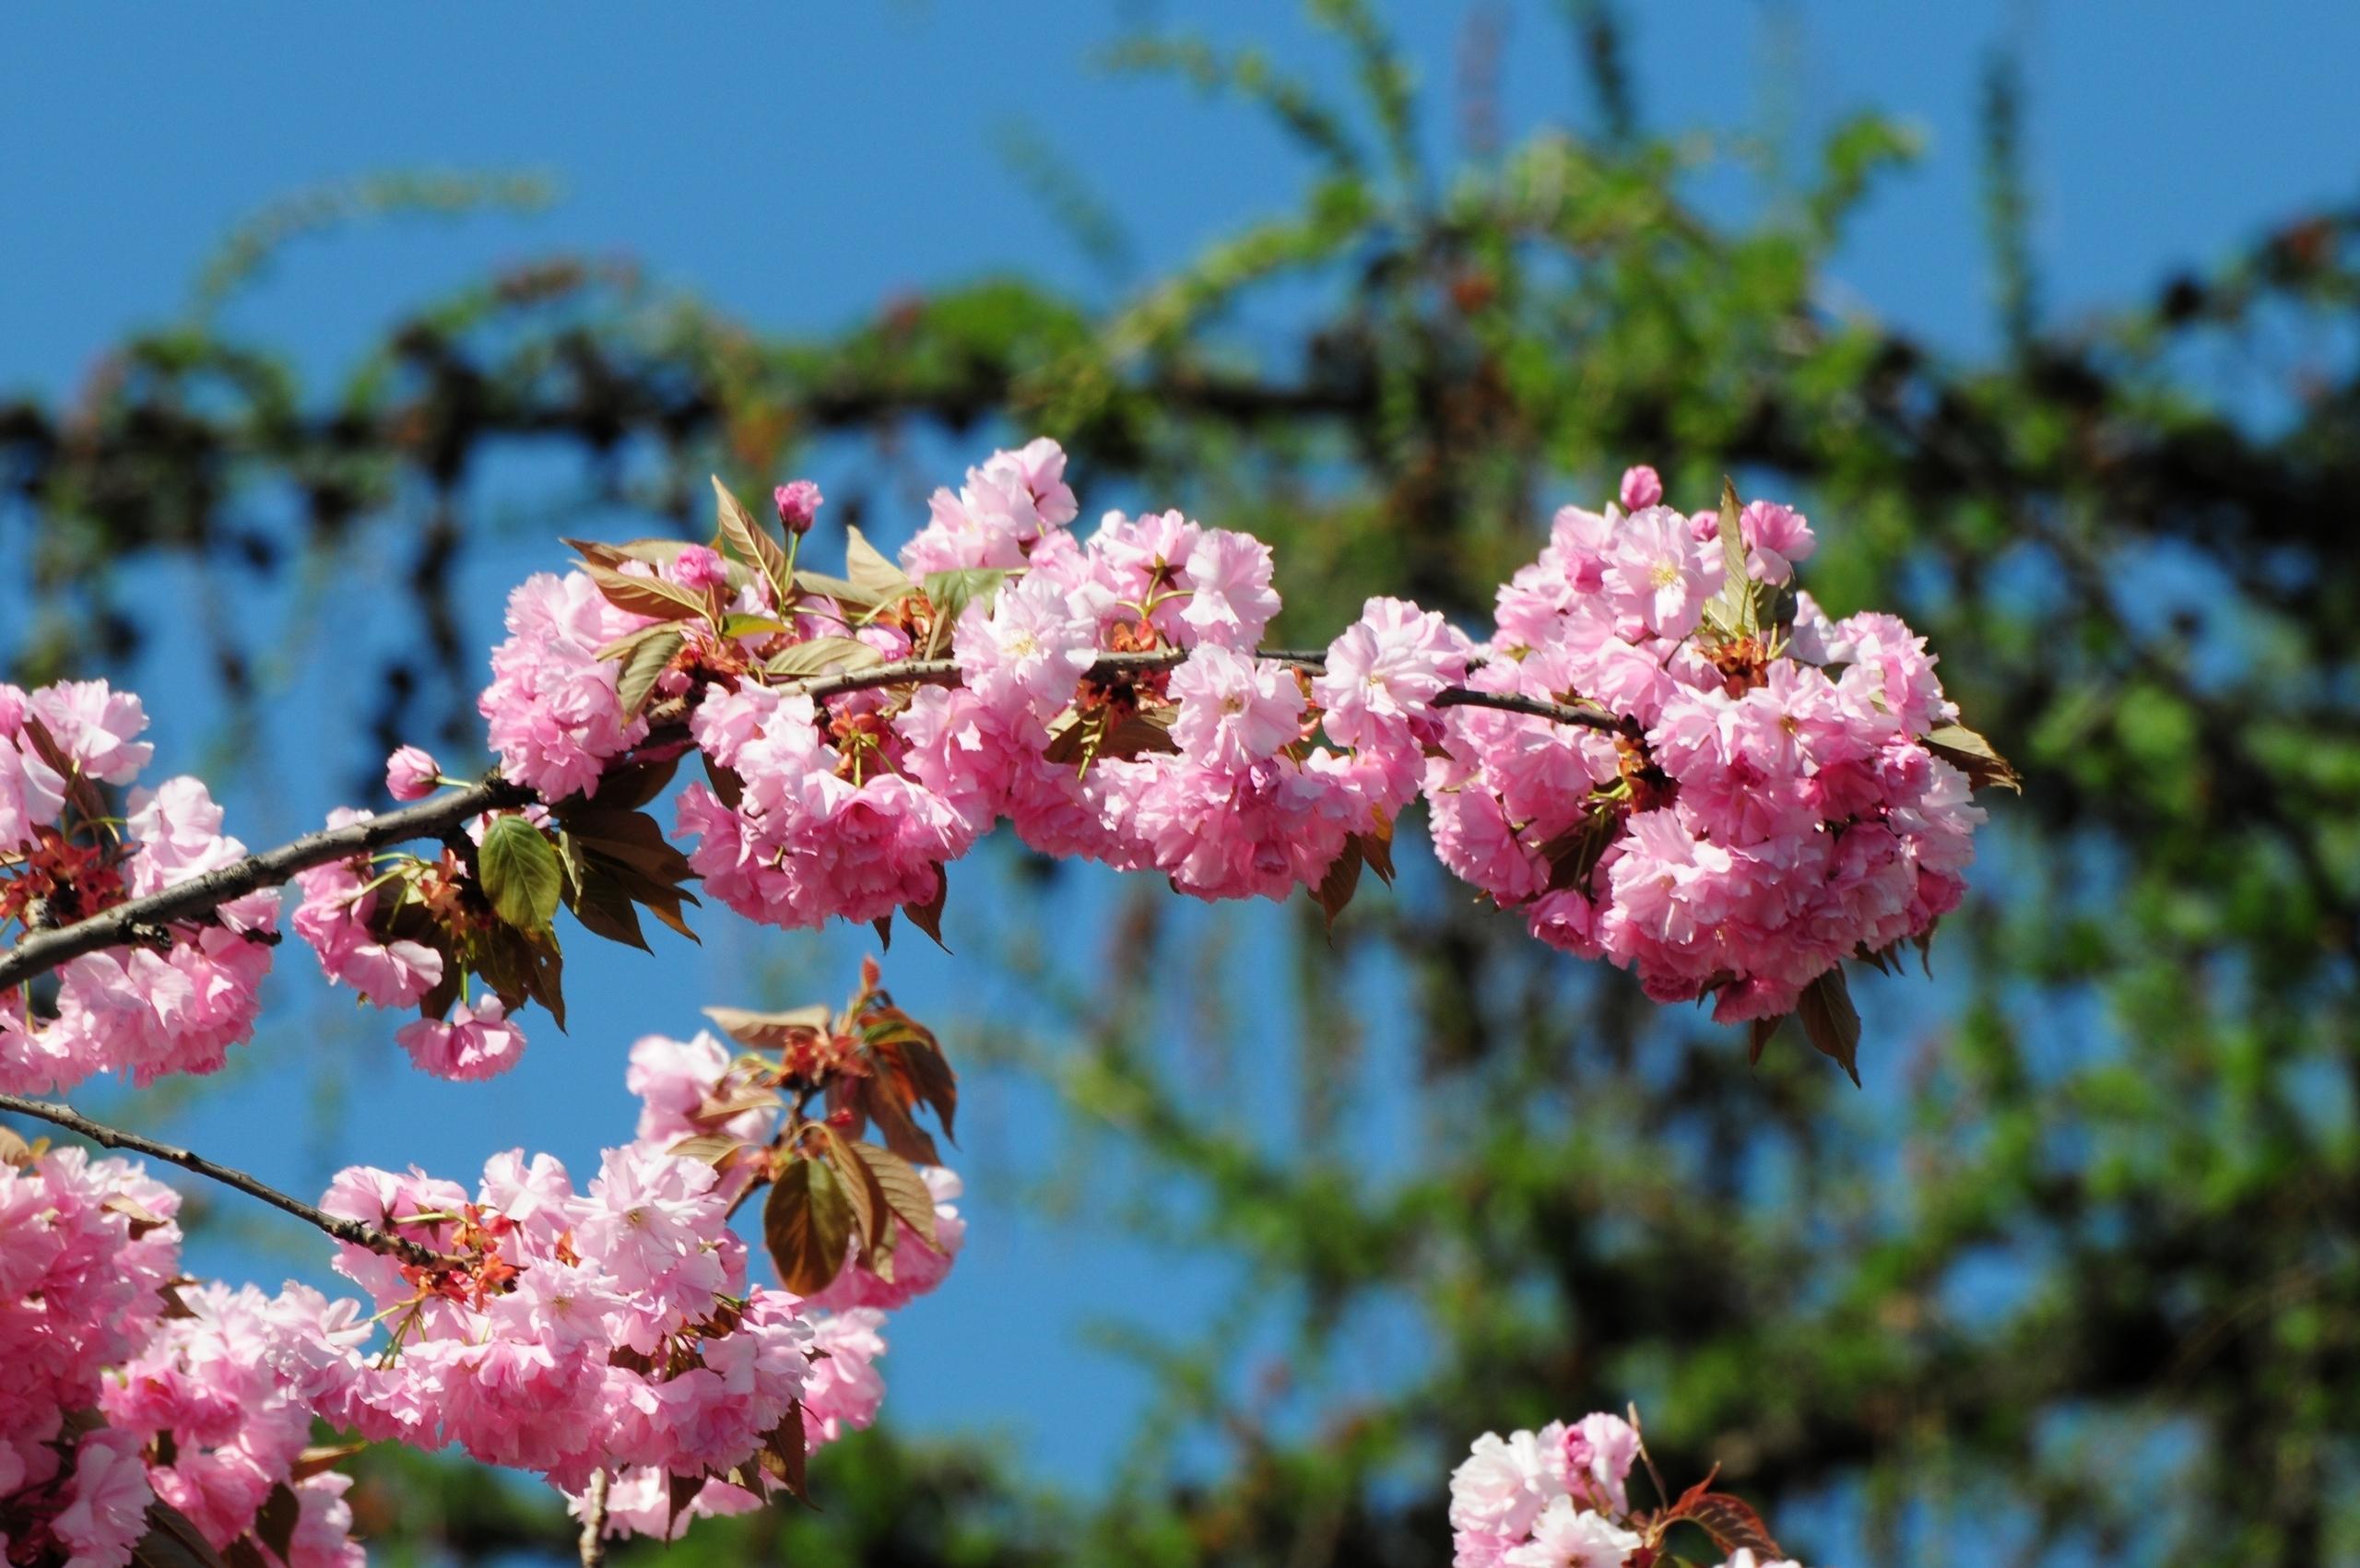 Tree Blossoms Trees Photo 23367124 Fanpop